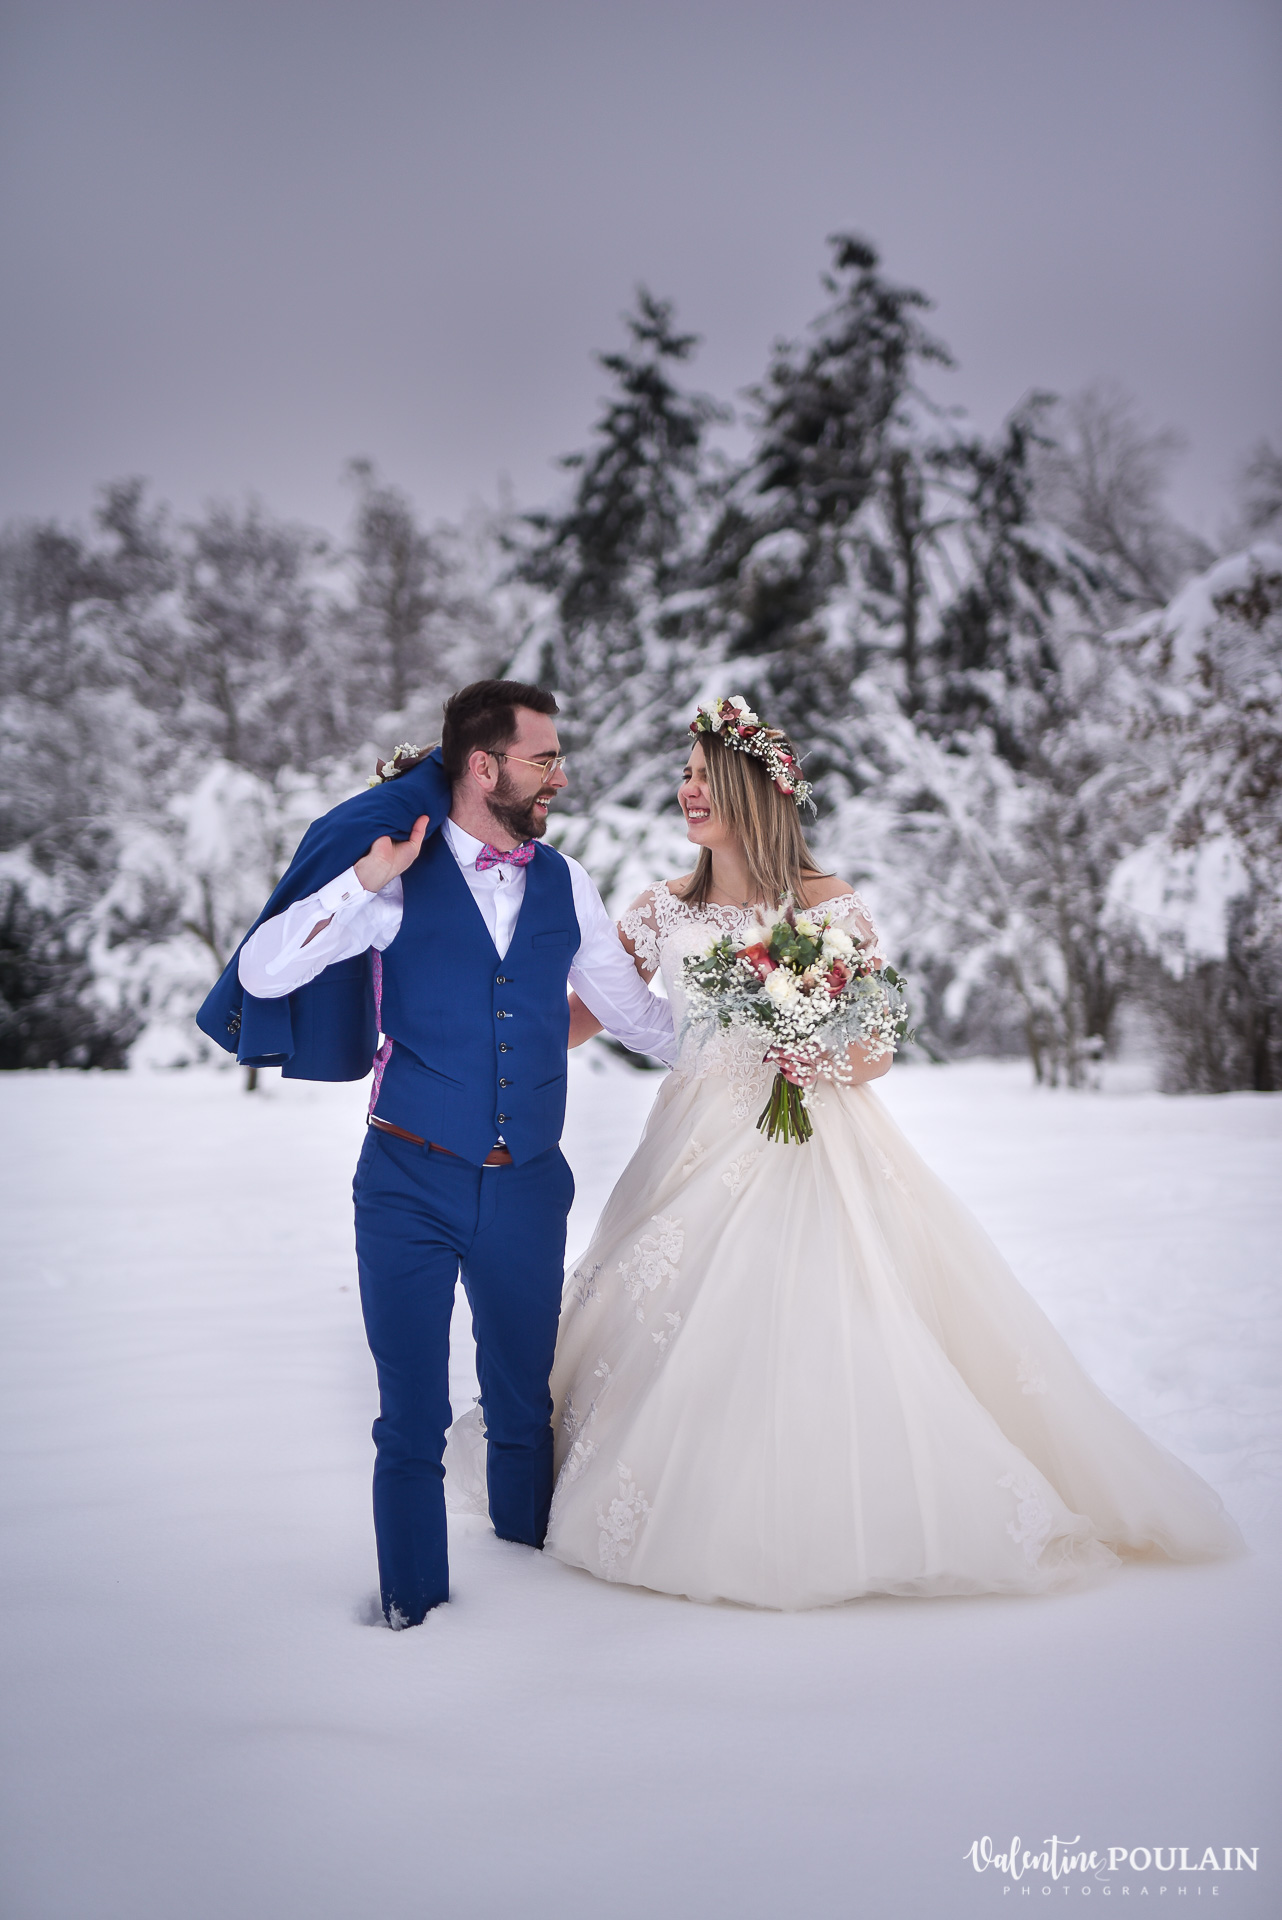 Photo mariage neige hiver - Valentine Poulain regards